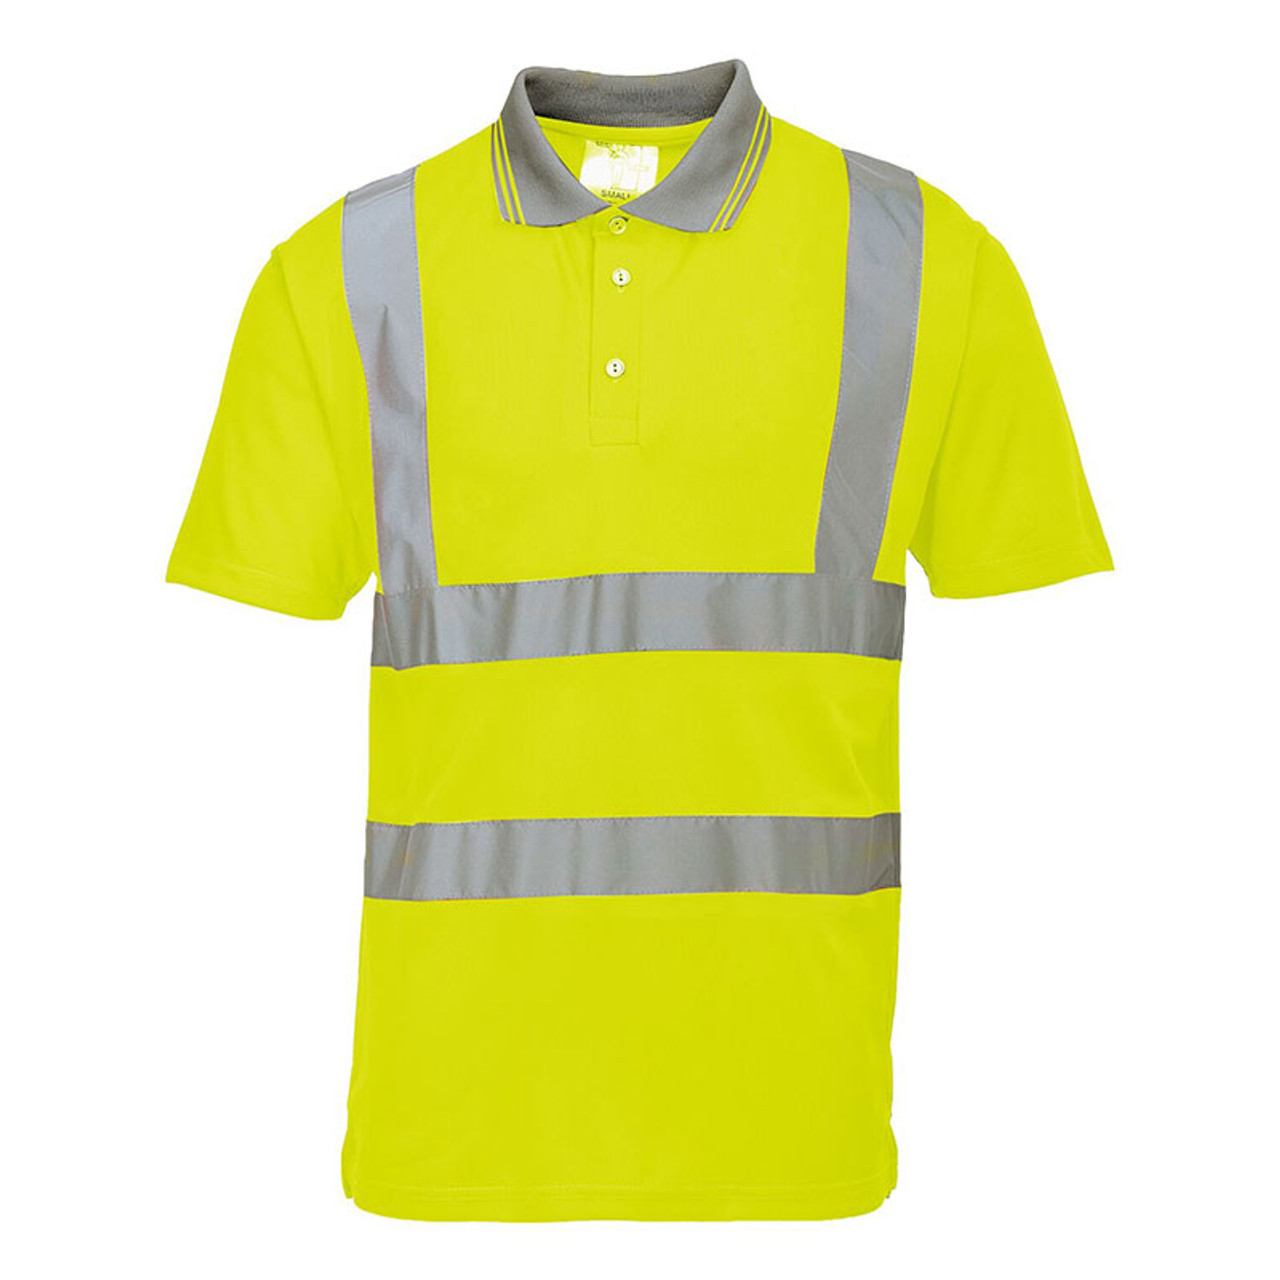 Portwest S477 Hi-Vis Reflective Safety Work Short Sleeve Polyester Polo ANSI